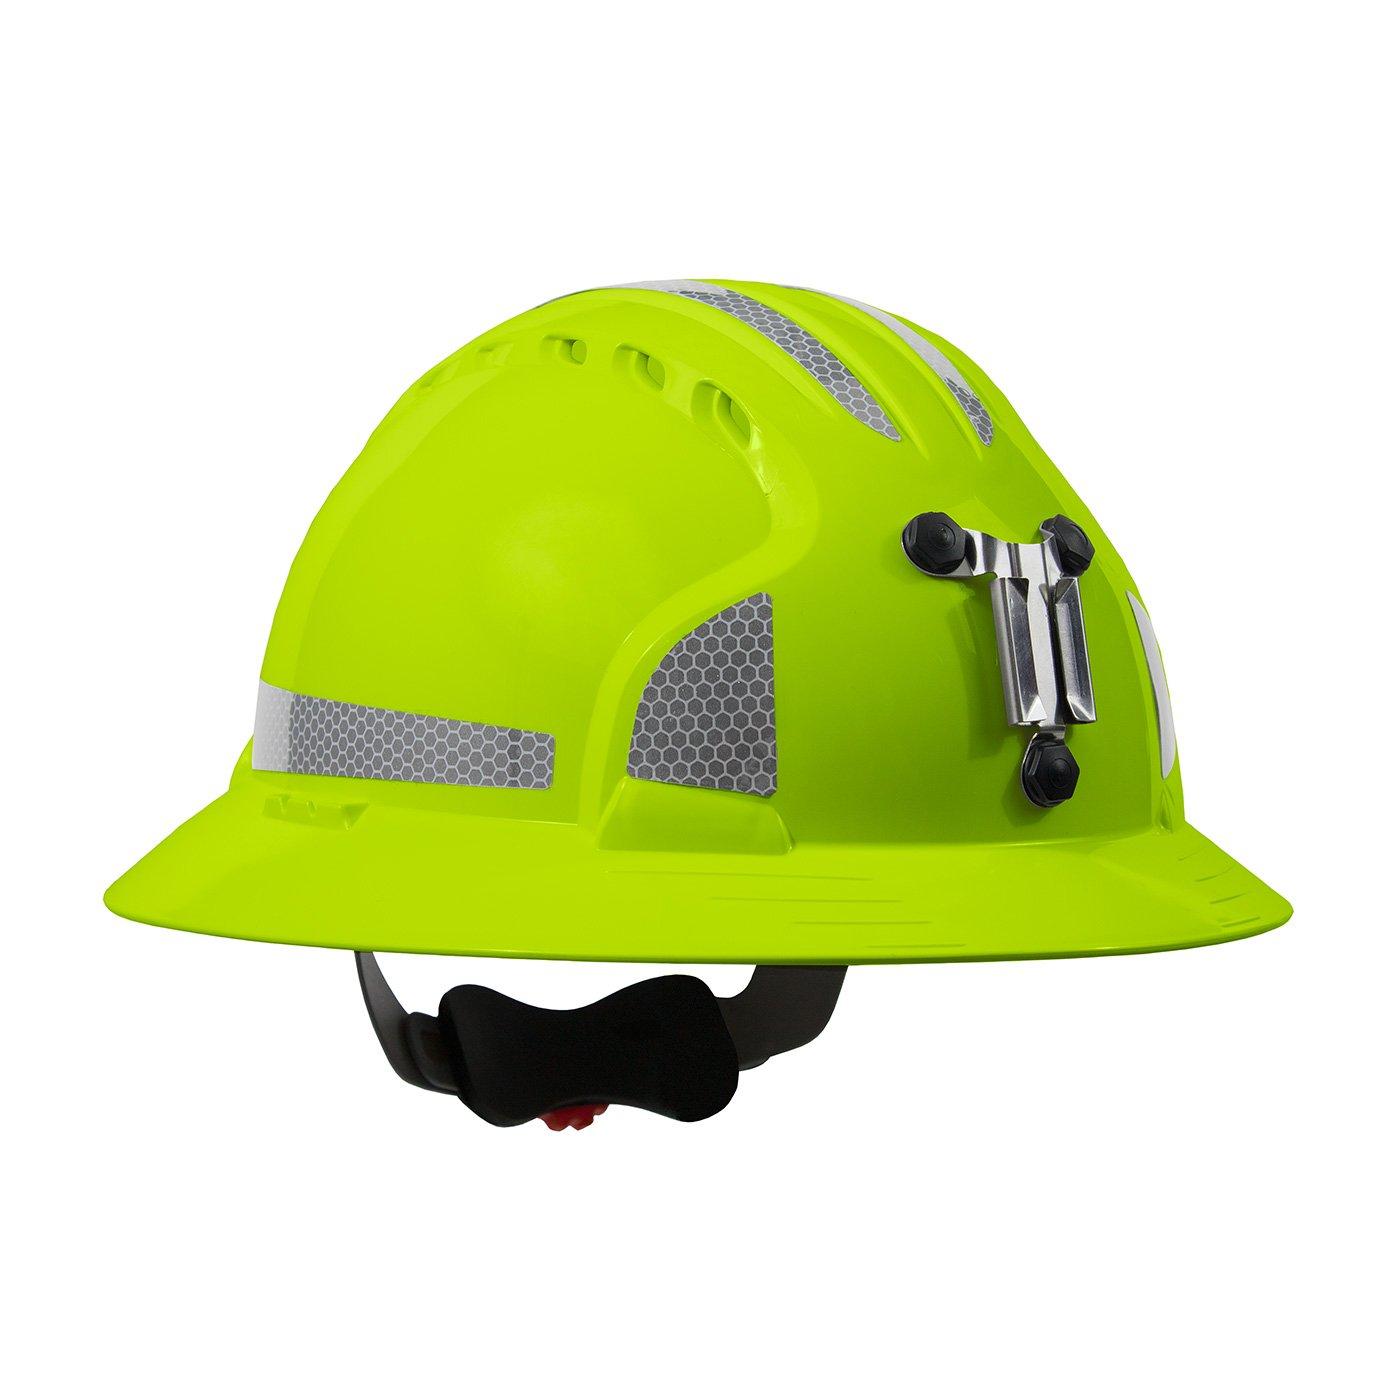 JSP 280-EV6161MCR2-LY Evolution Deluxe 6161 Full Brim Mining Hard Hat with CR2 Reflective Kit by JSP (Image #1)